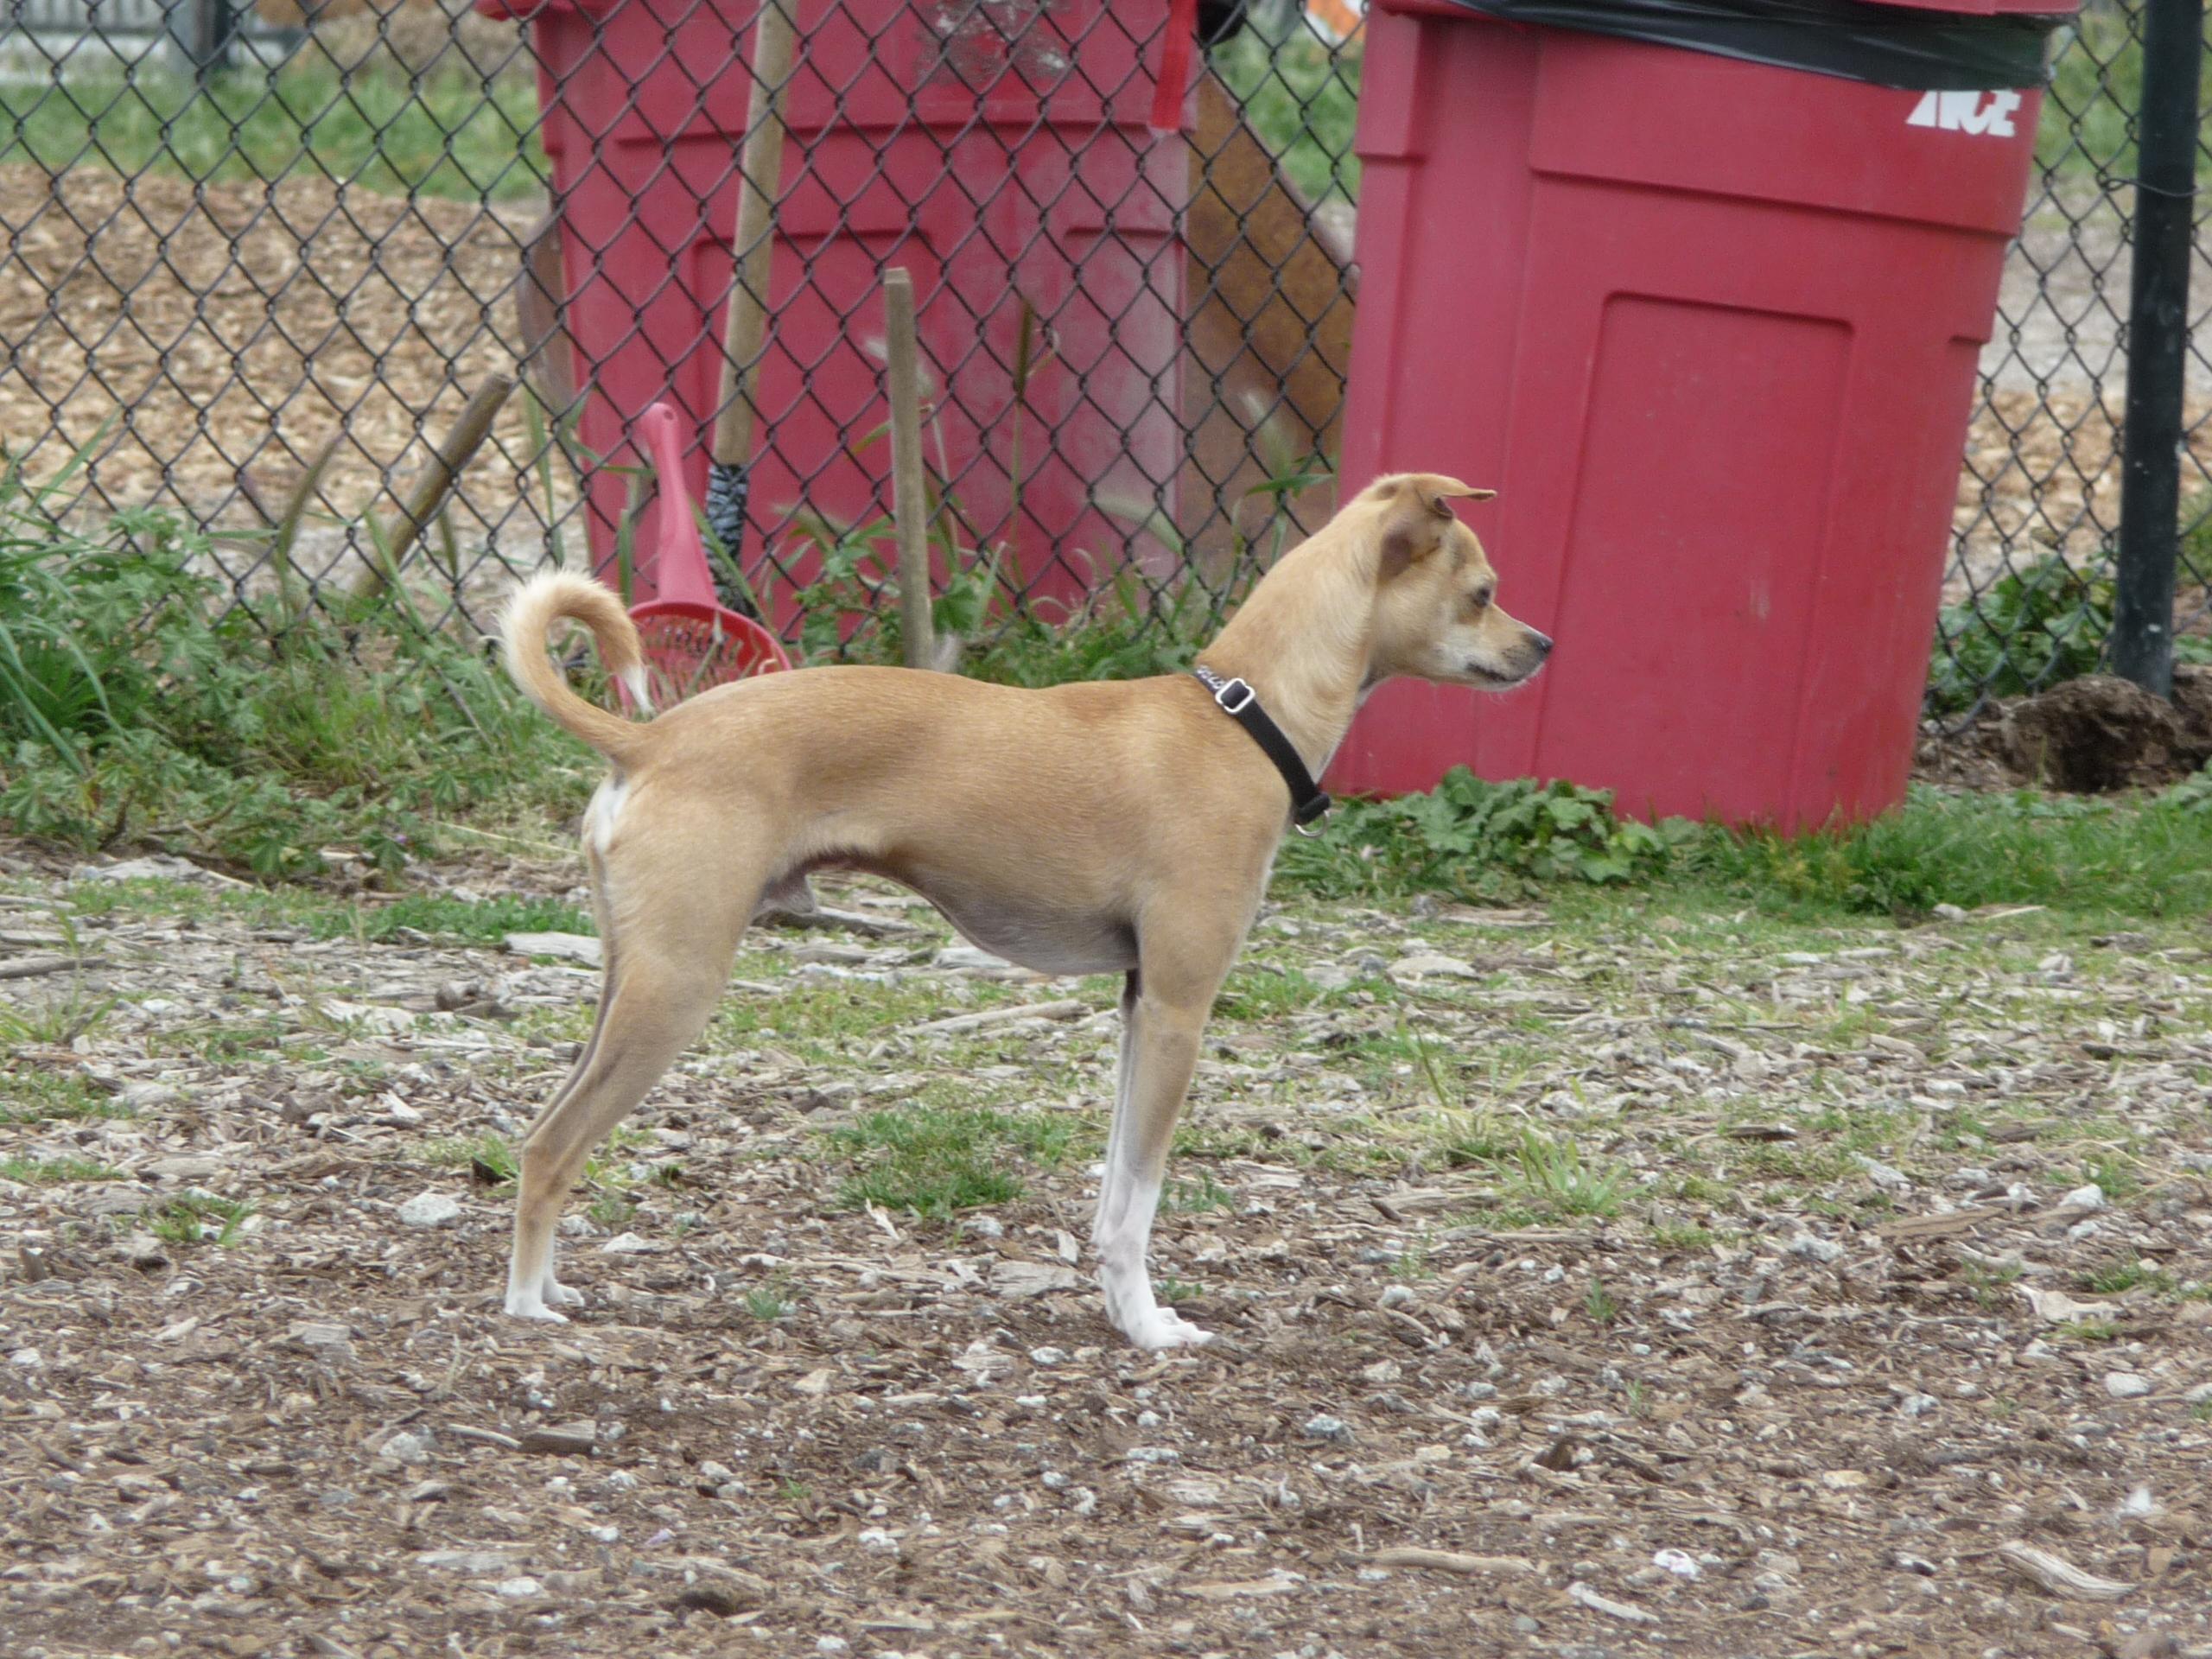 Deer Chihuahua Breeds Landrace/deer chihuahua: